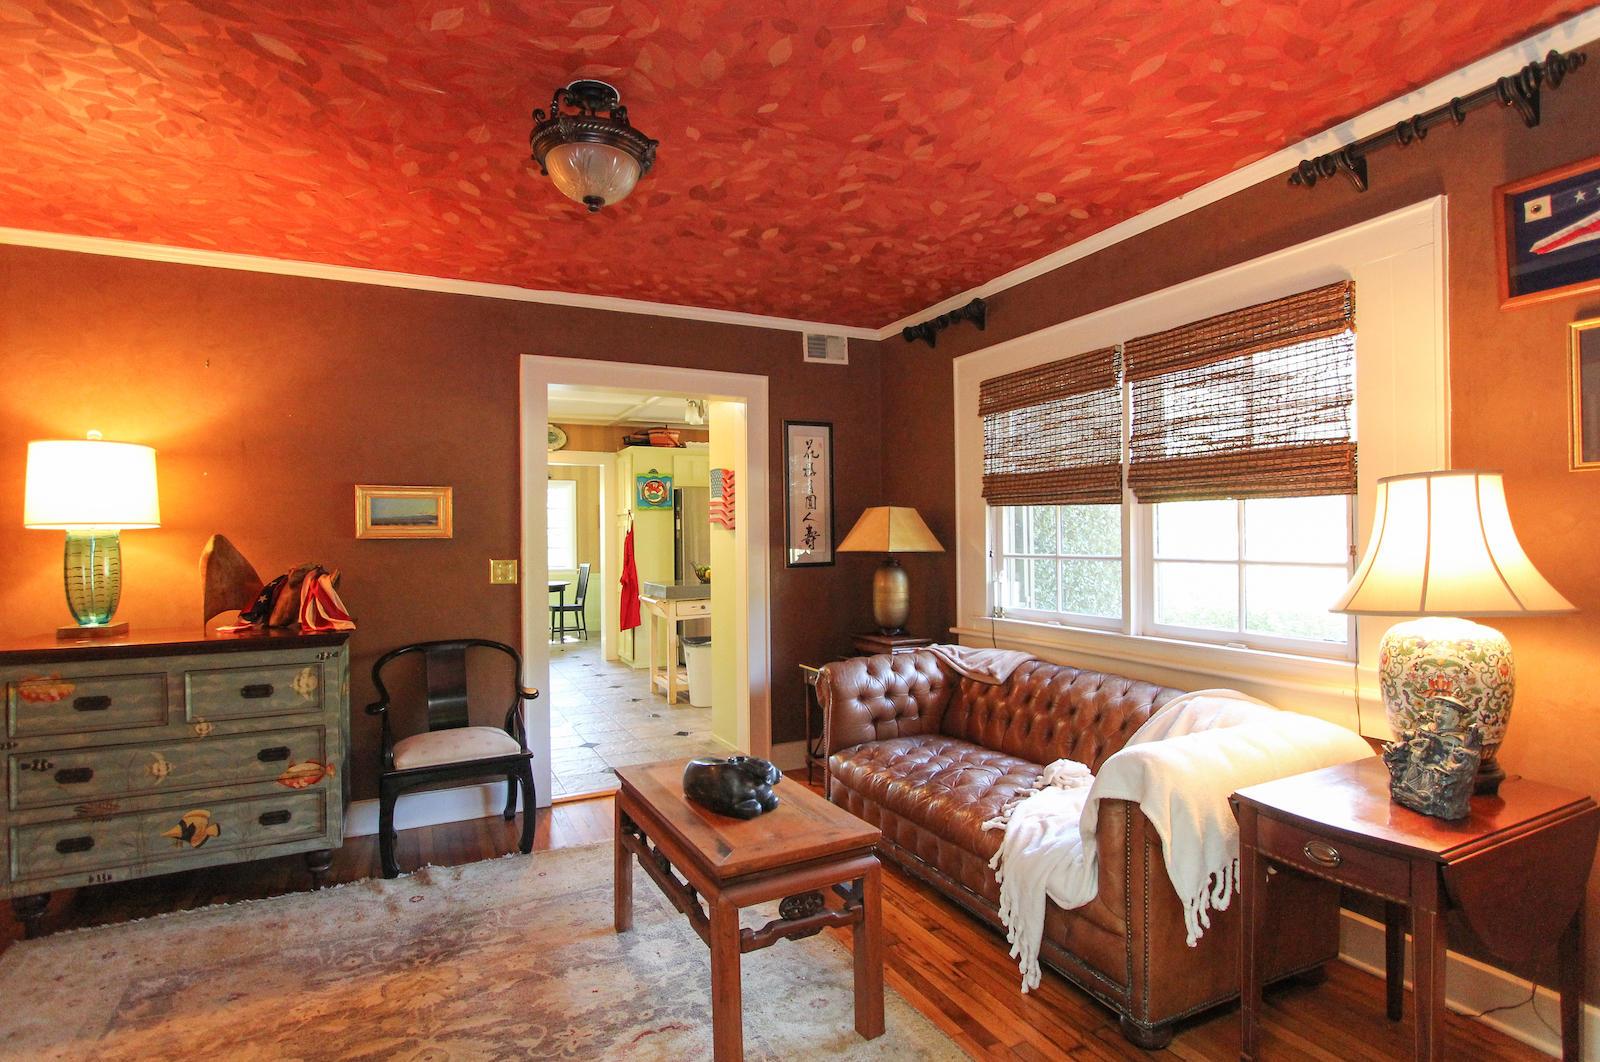 Albemarle Point Homes For Sale - 3 Albemarle, Charleston, SC - 22